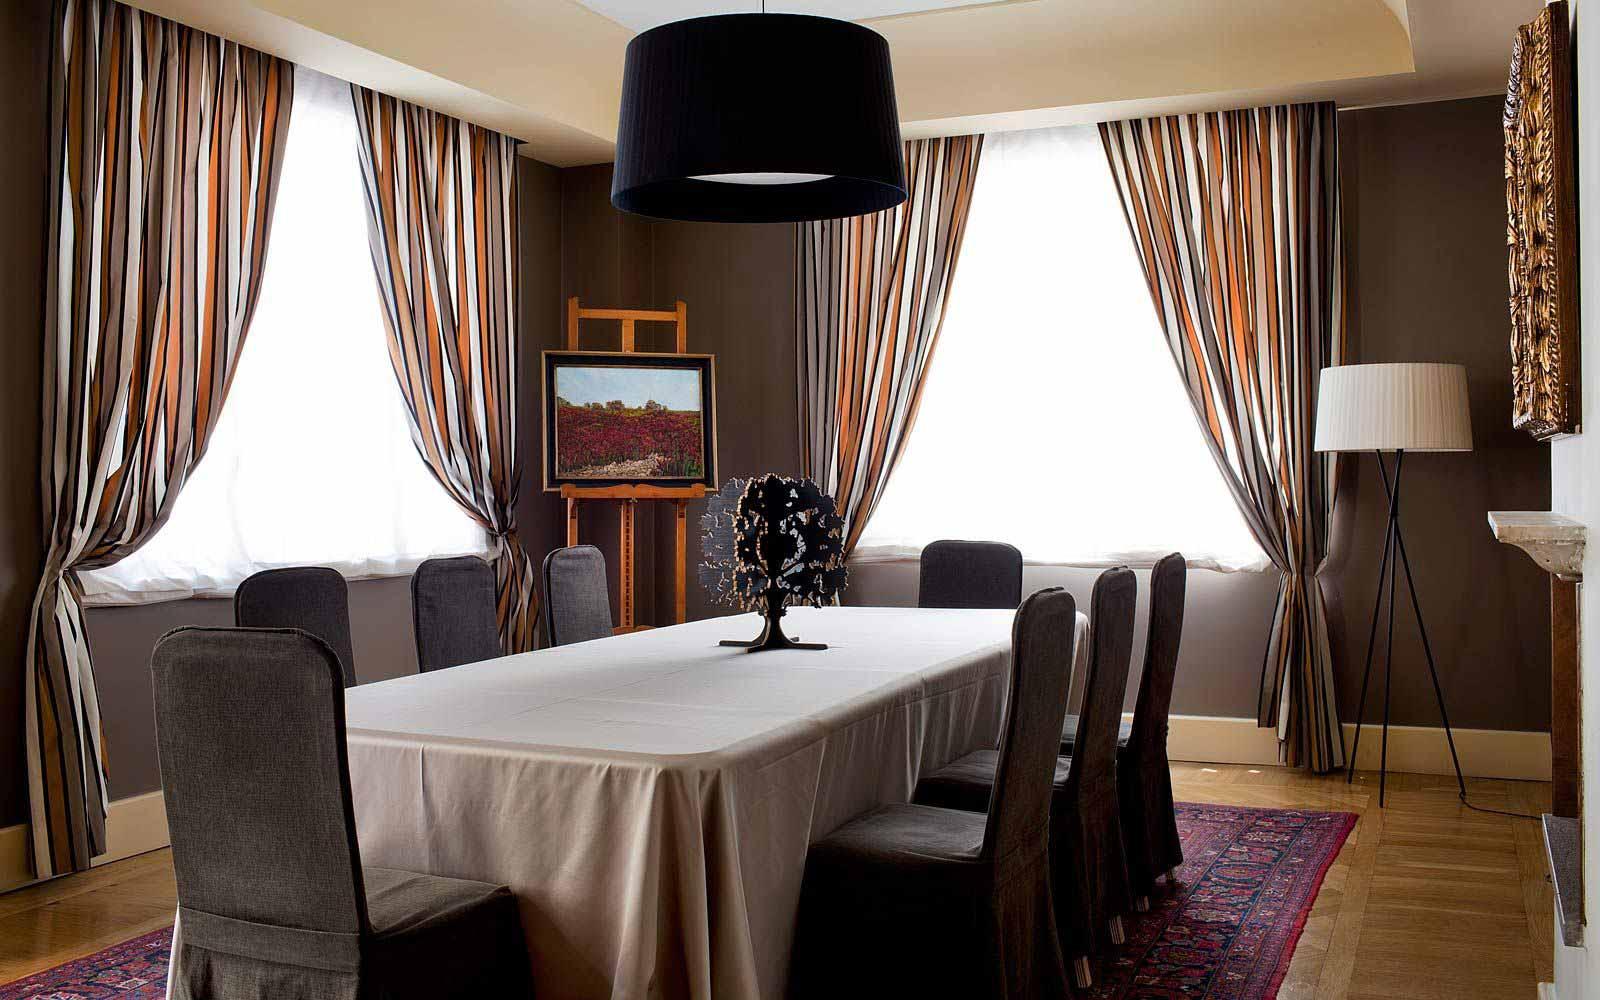 Dining room at Hotel Principe Di Villafranca